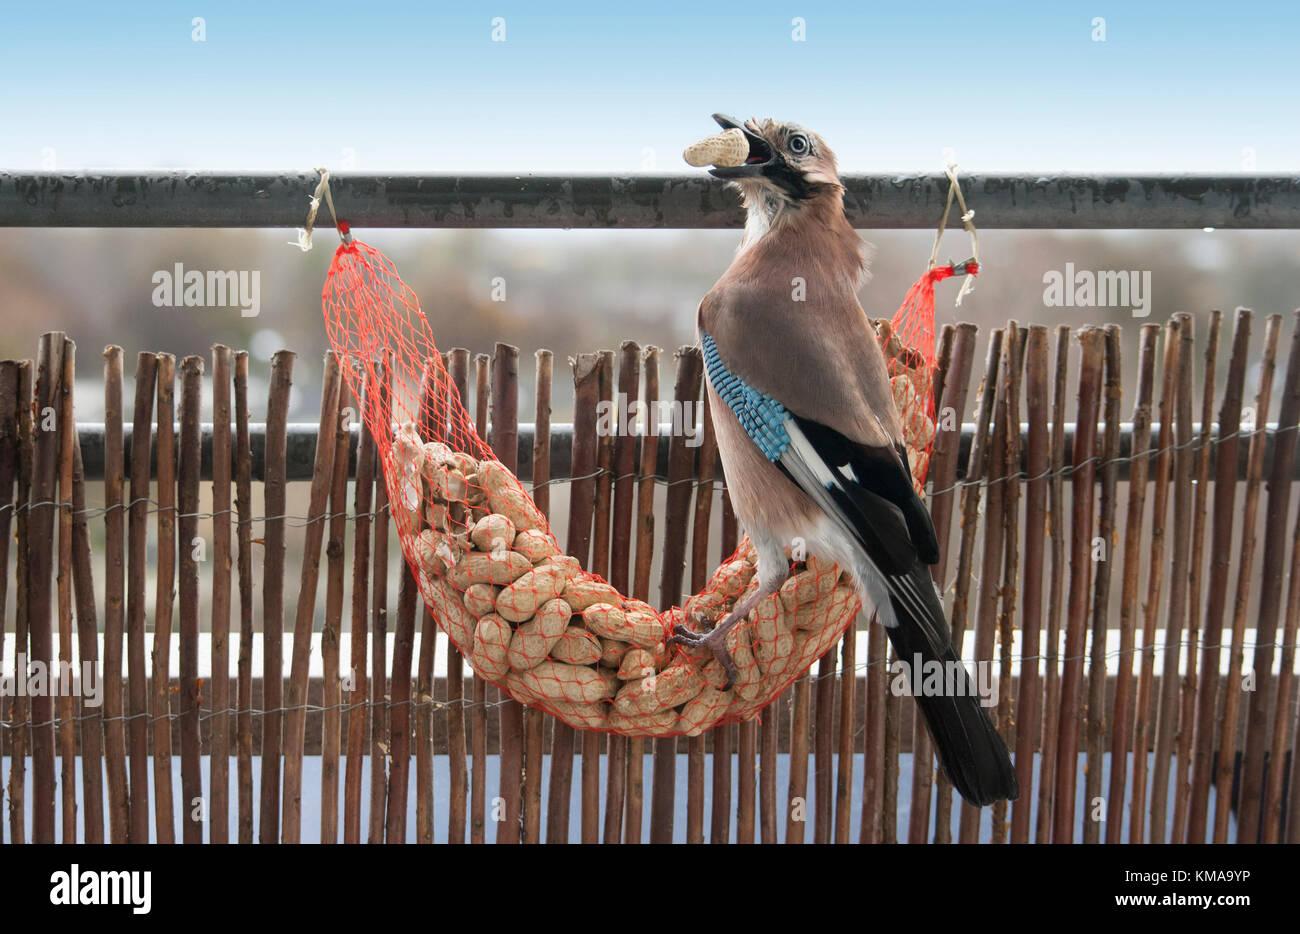 Garrulus glandarius, Eurasian Jay eating shell peanuts from feeding net - Stock Image